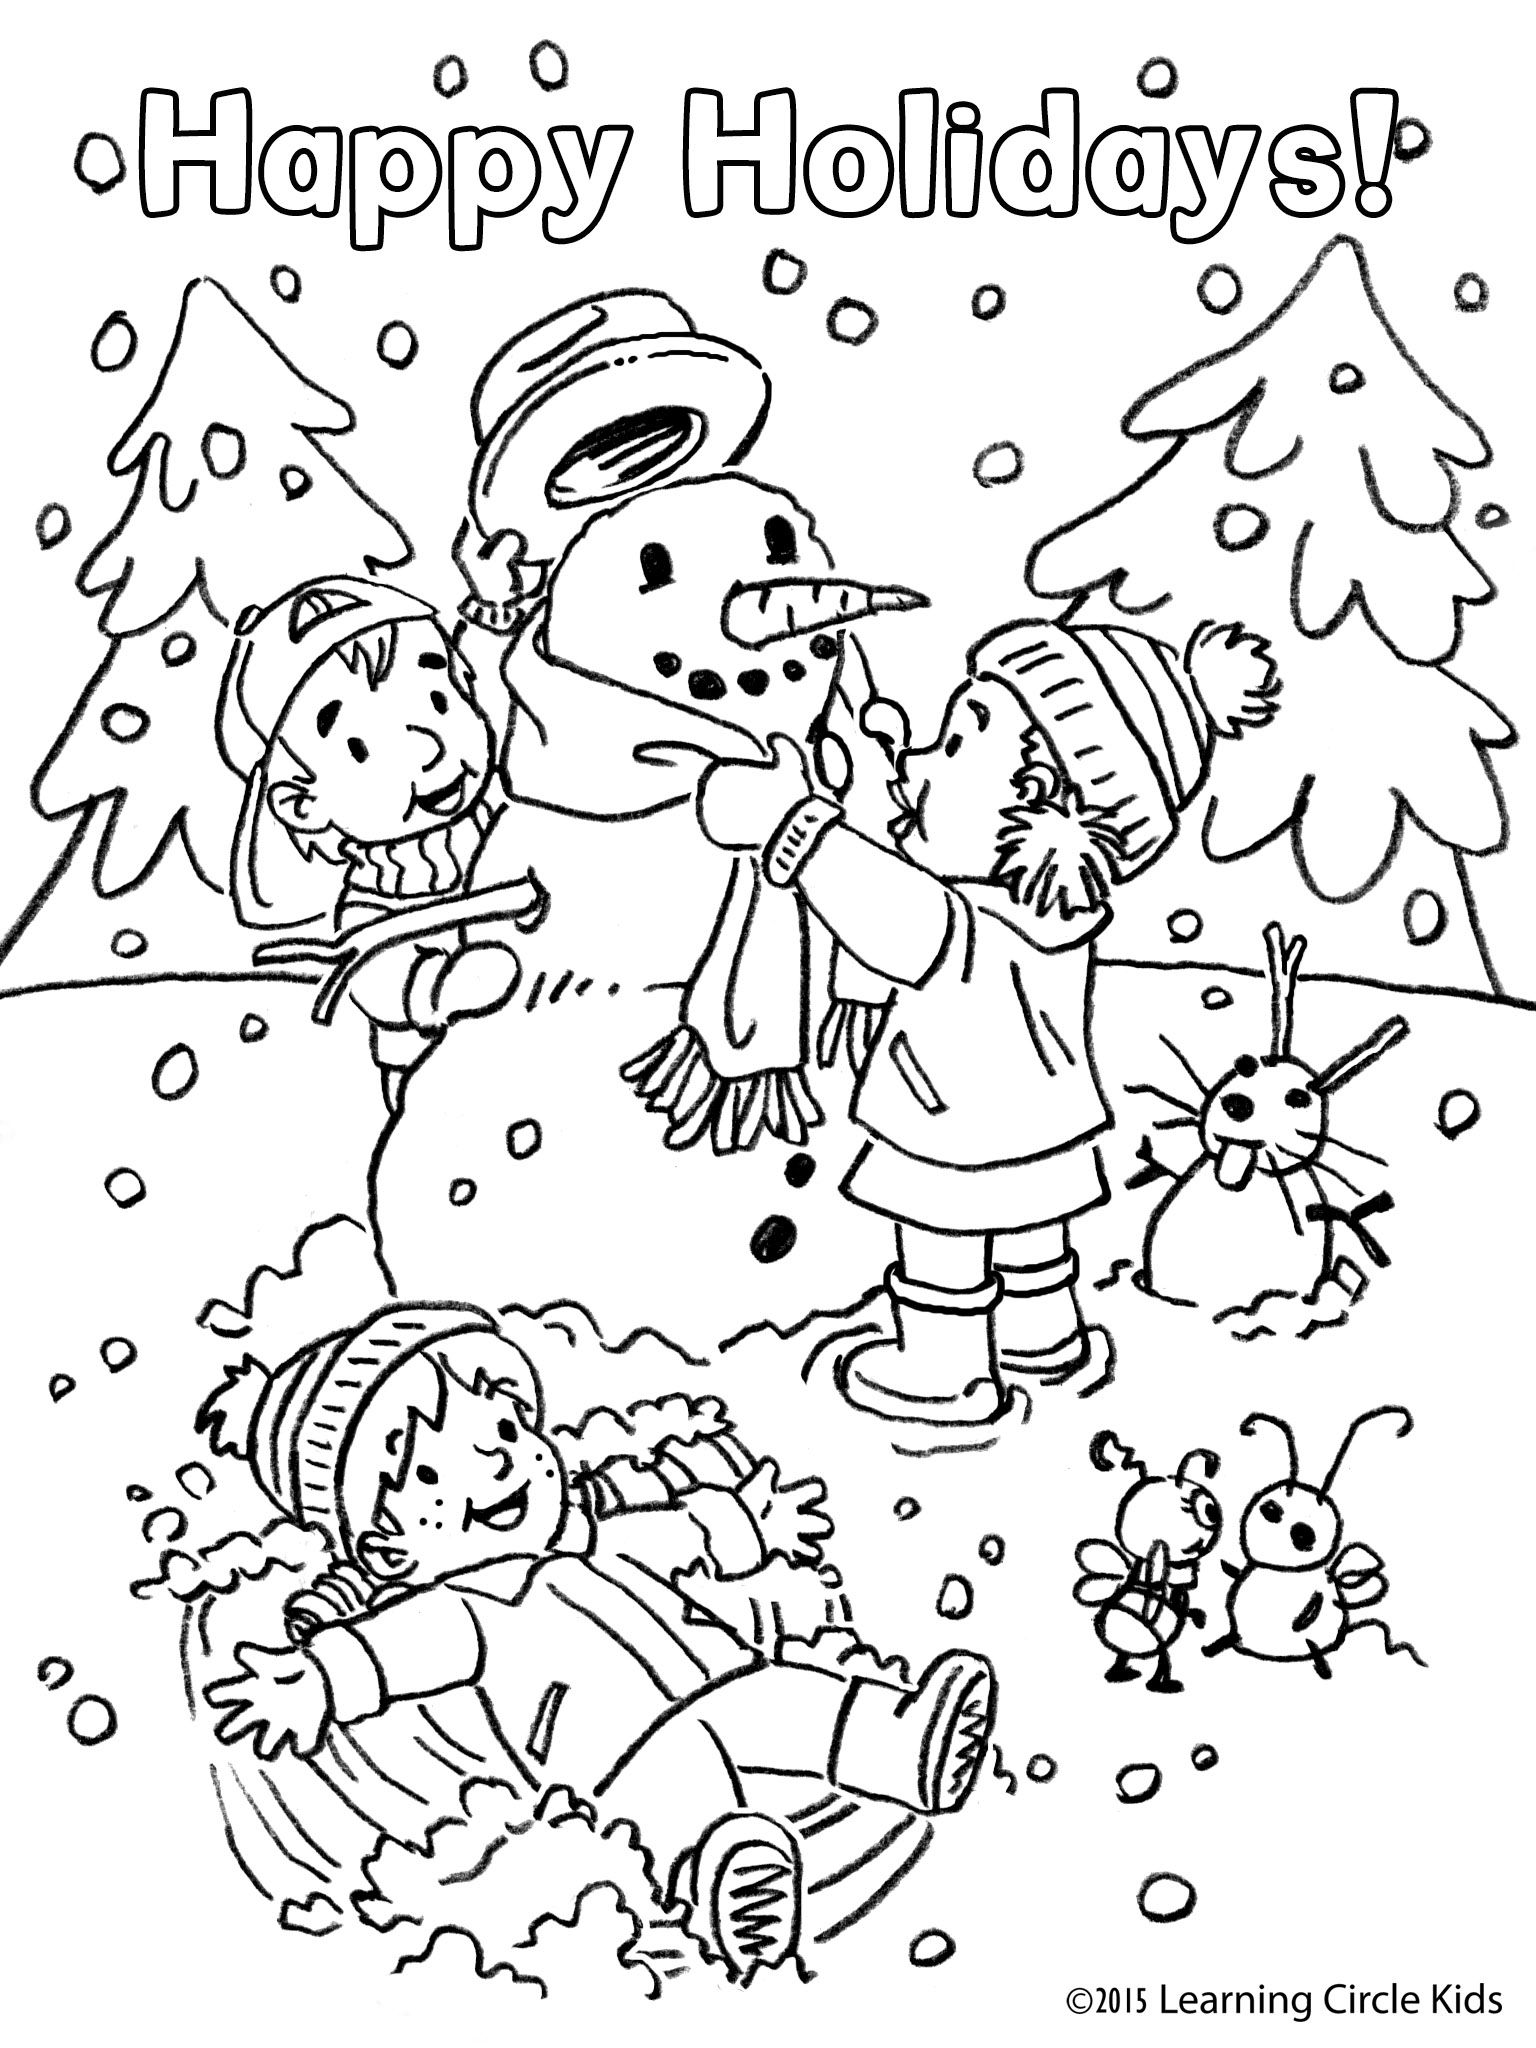 Happy Holidays Snowman Coloring Page Readerbee